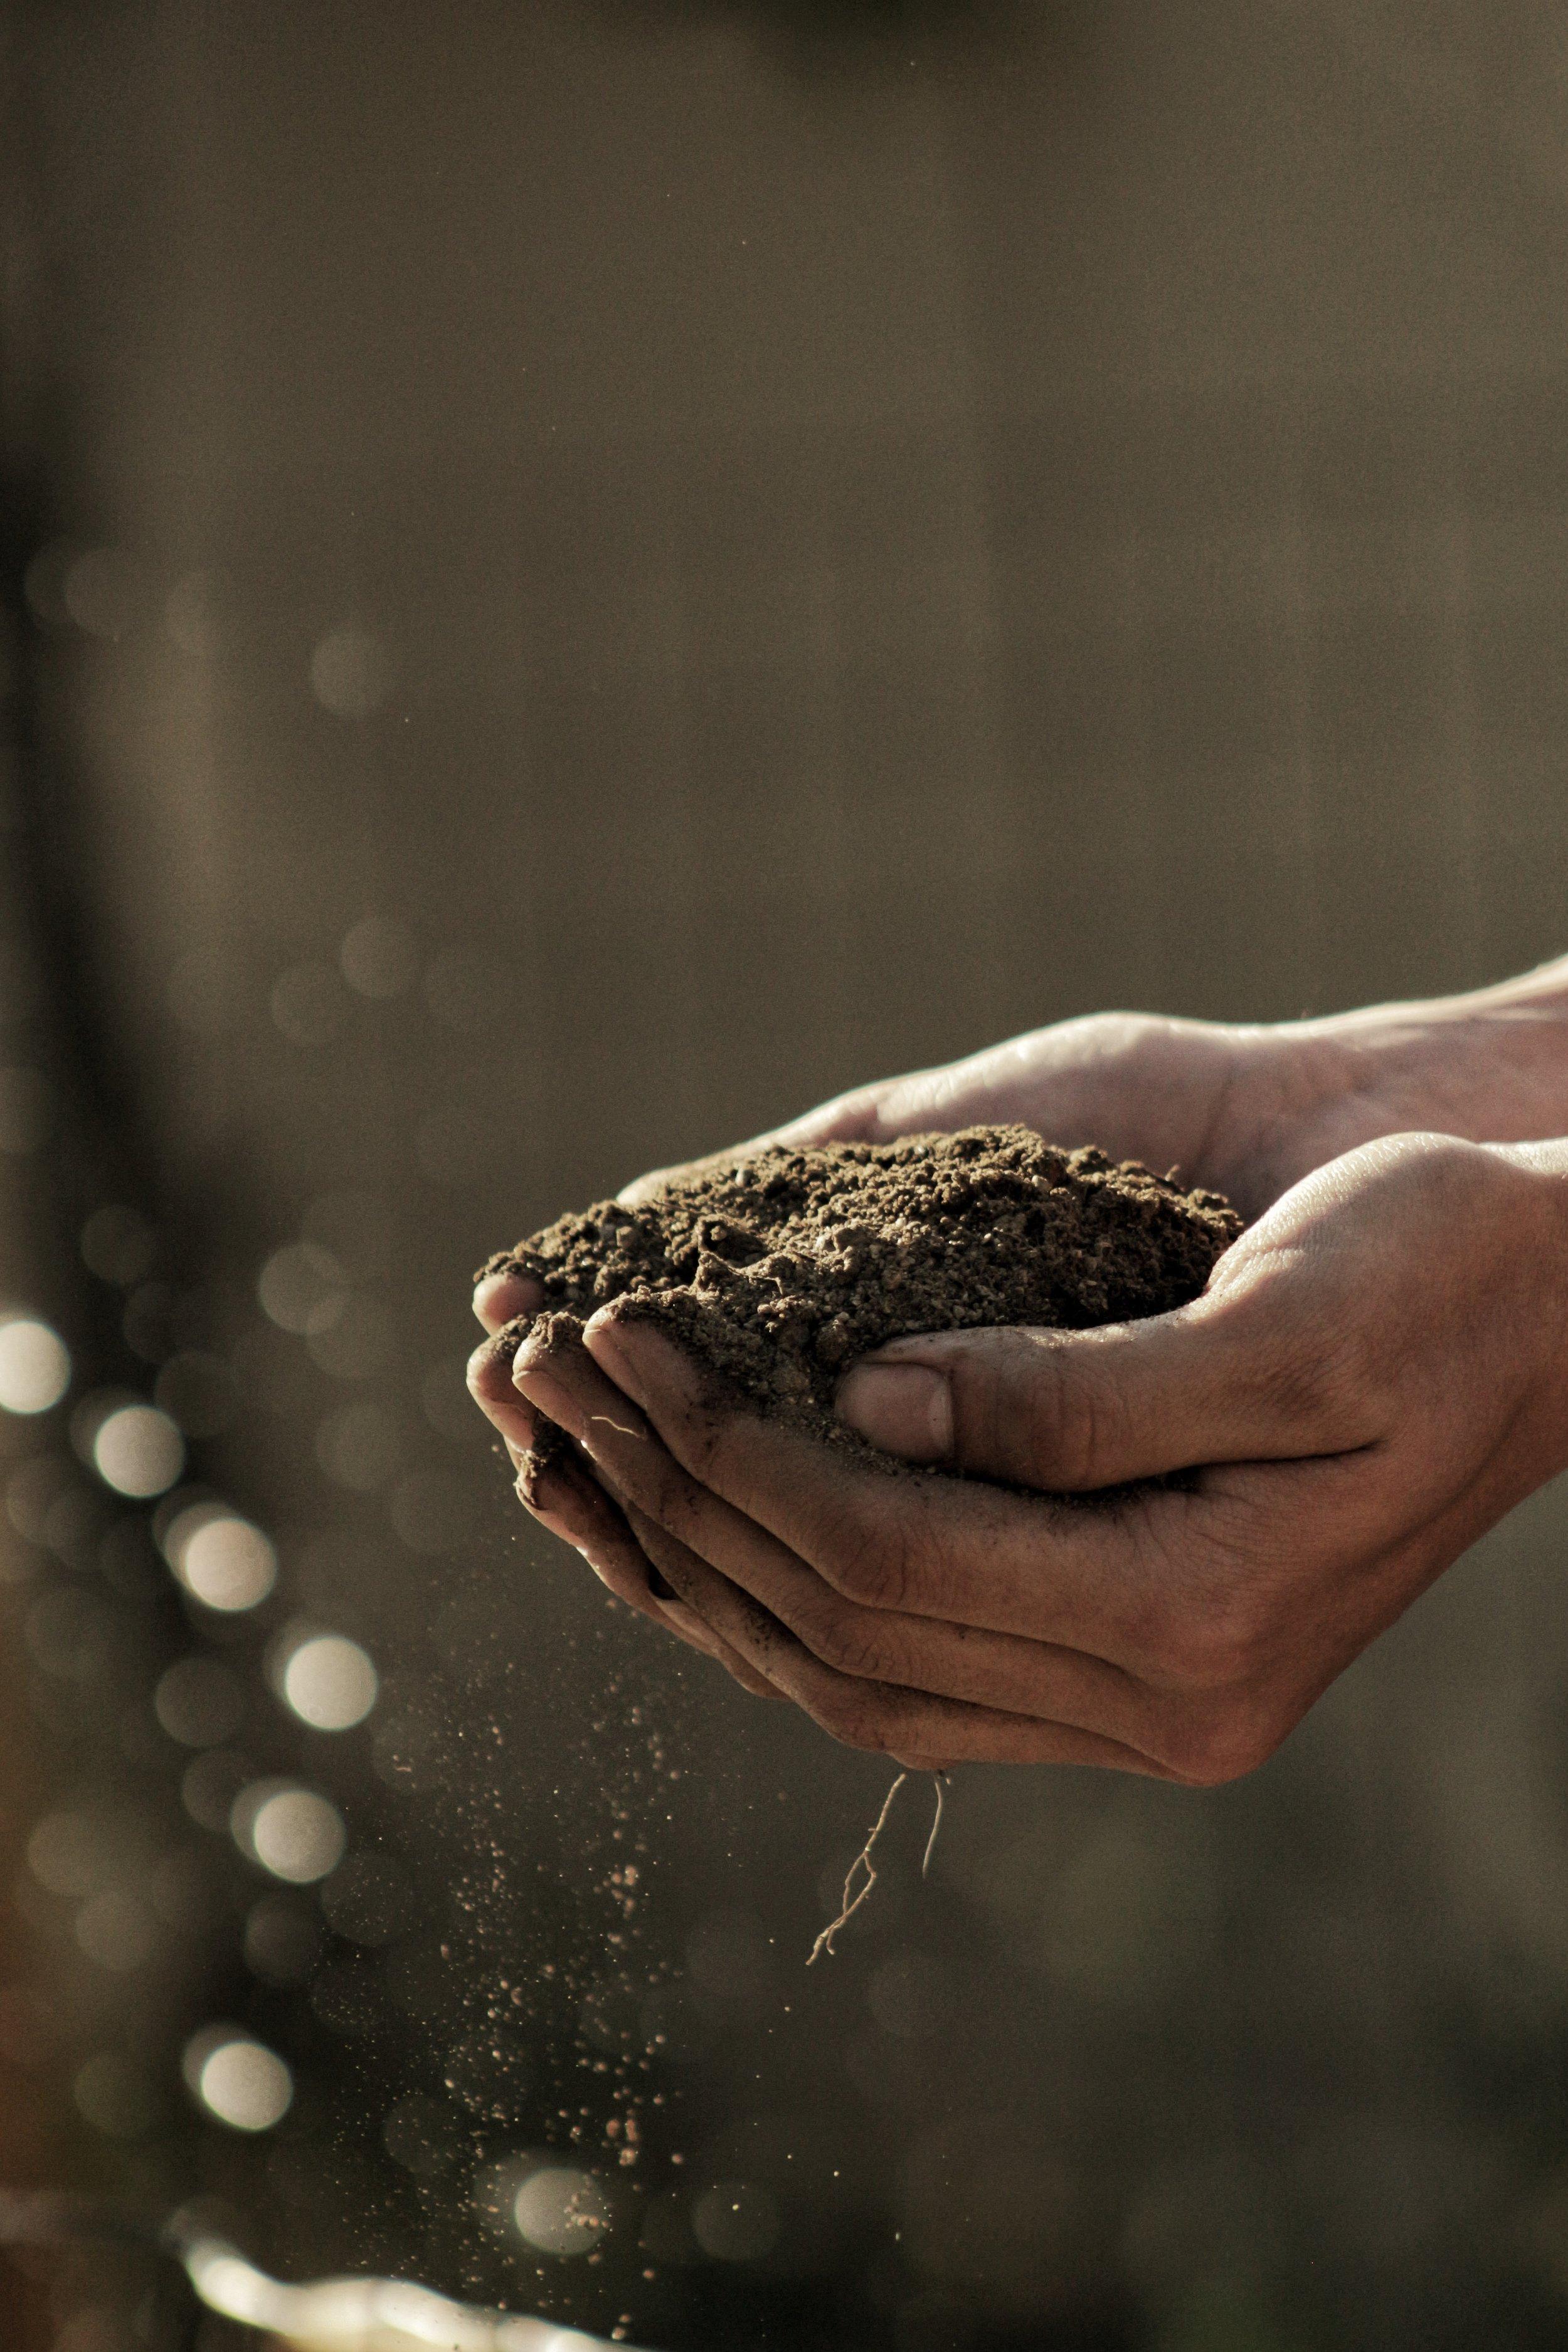 Hand holding dirt. Farmer. Photo source Gabriel Jimenez on Unsplash